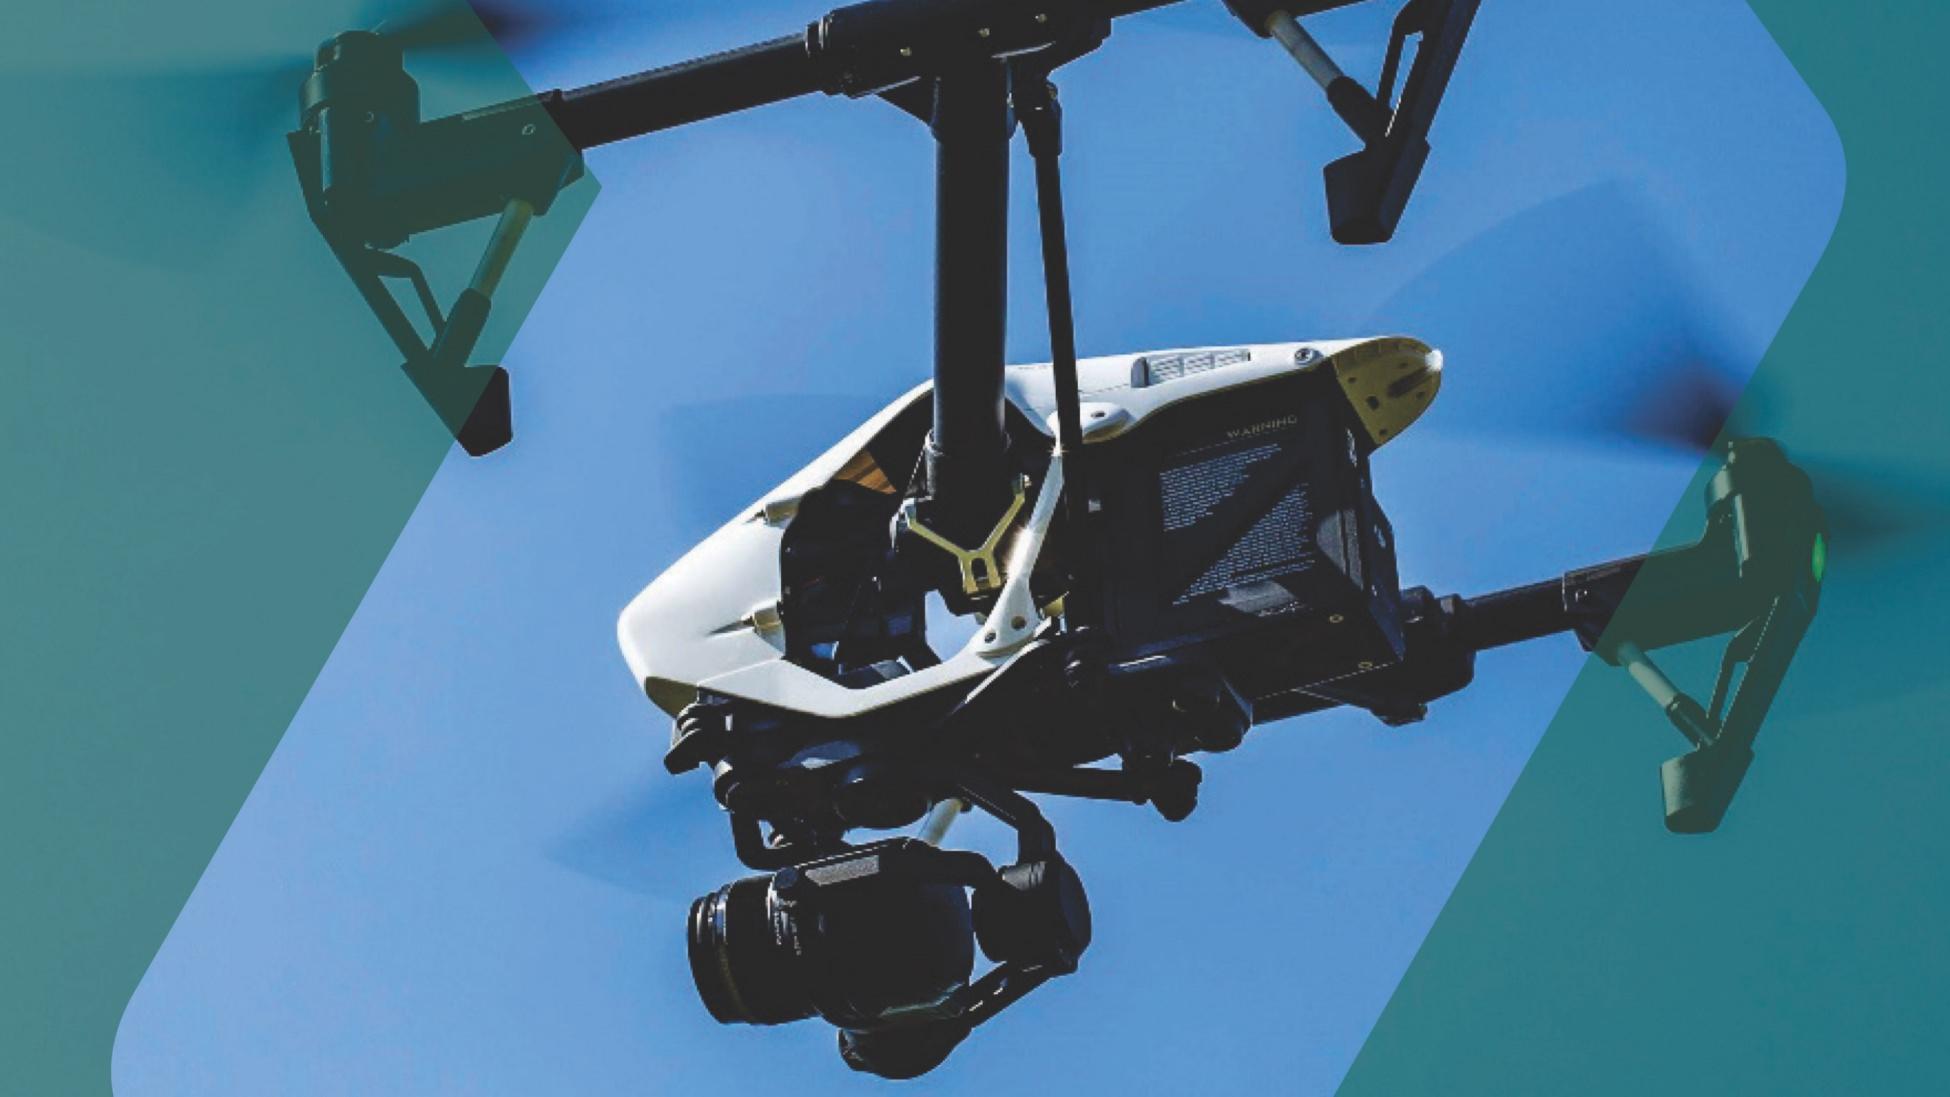 DJI welcomes new UK drone regulation